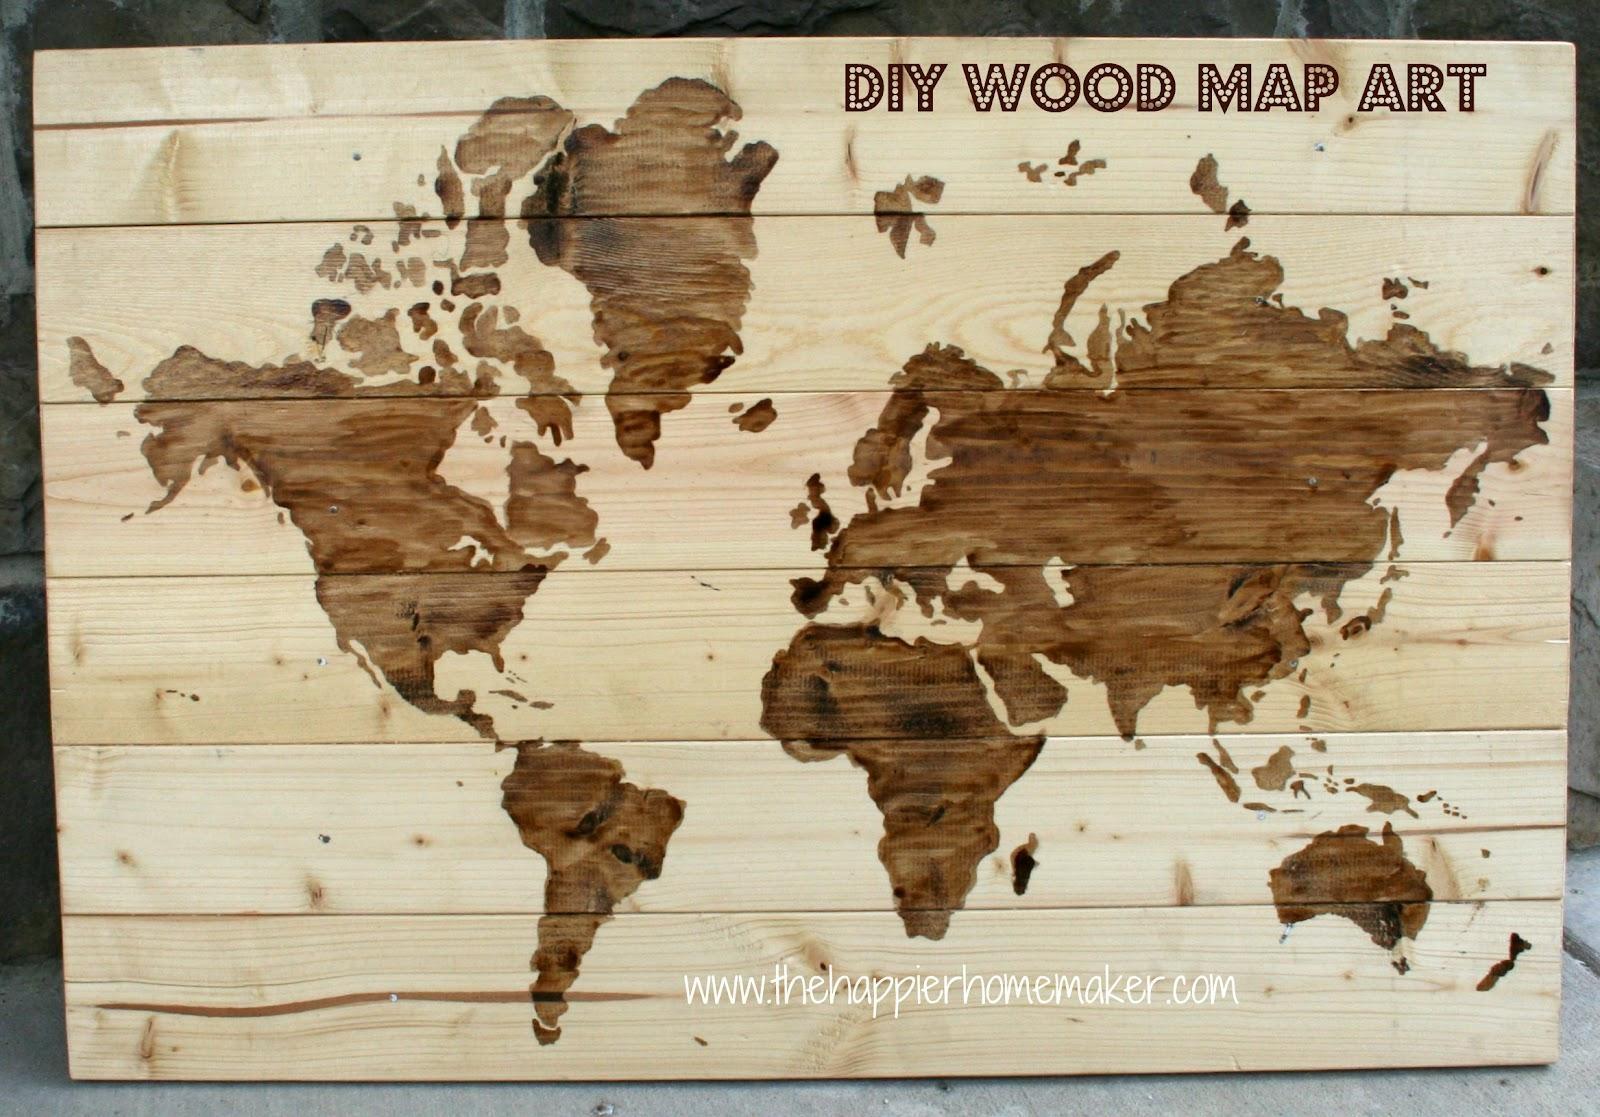 Diy Wooden World Map Art | The Happier Homemaker With Regard To Wooden World Map Wall Art (View 8 of 20)